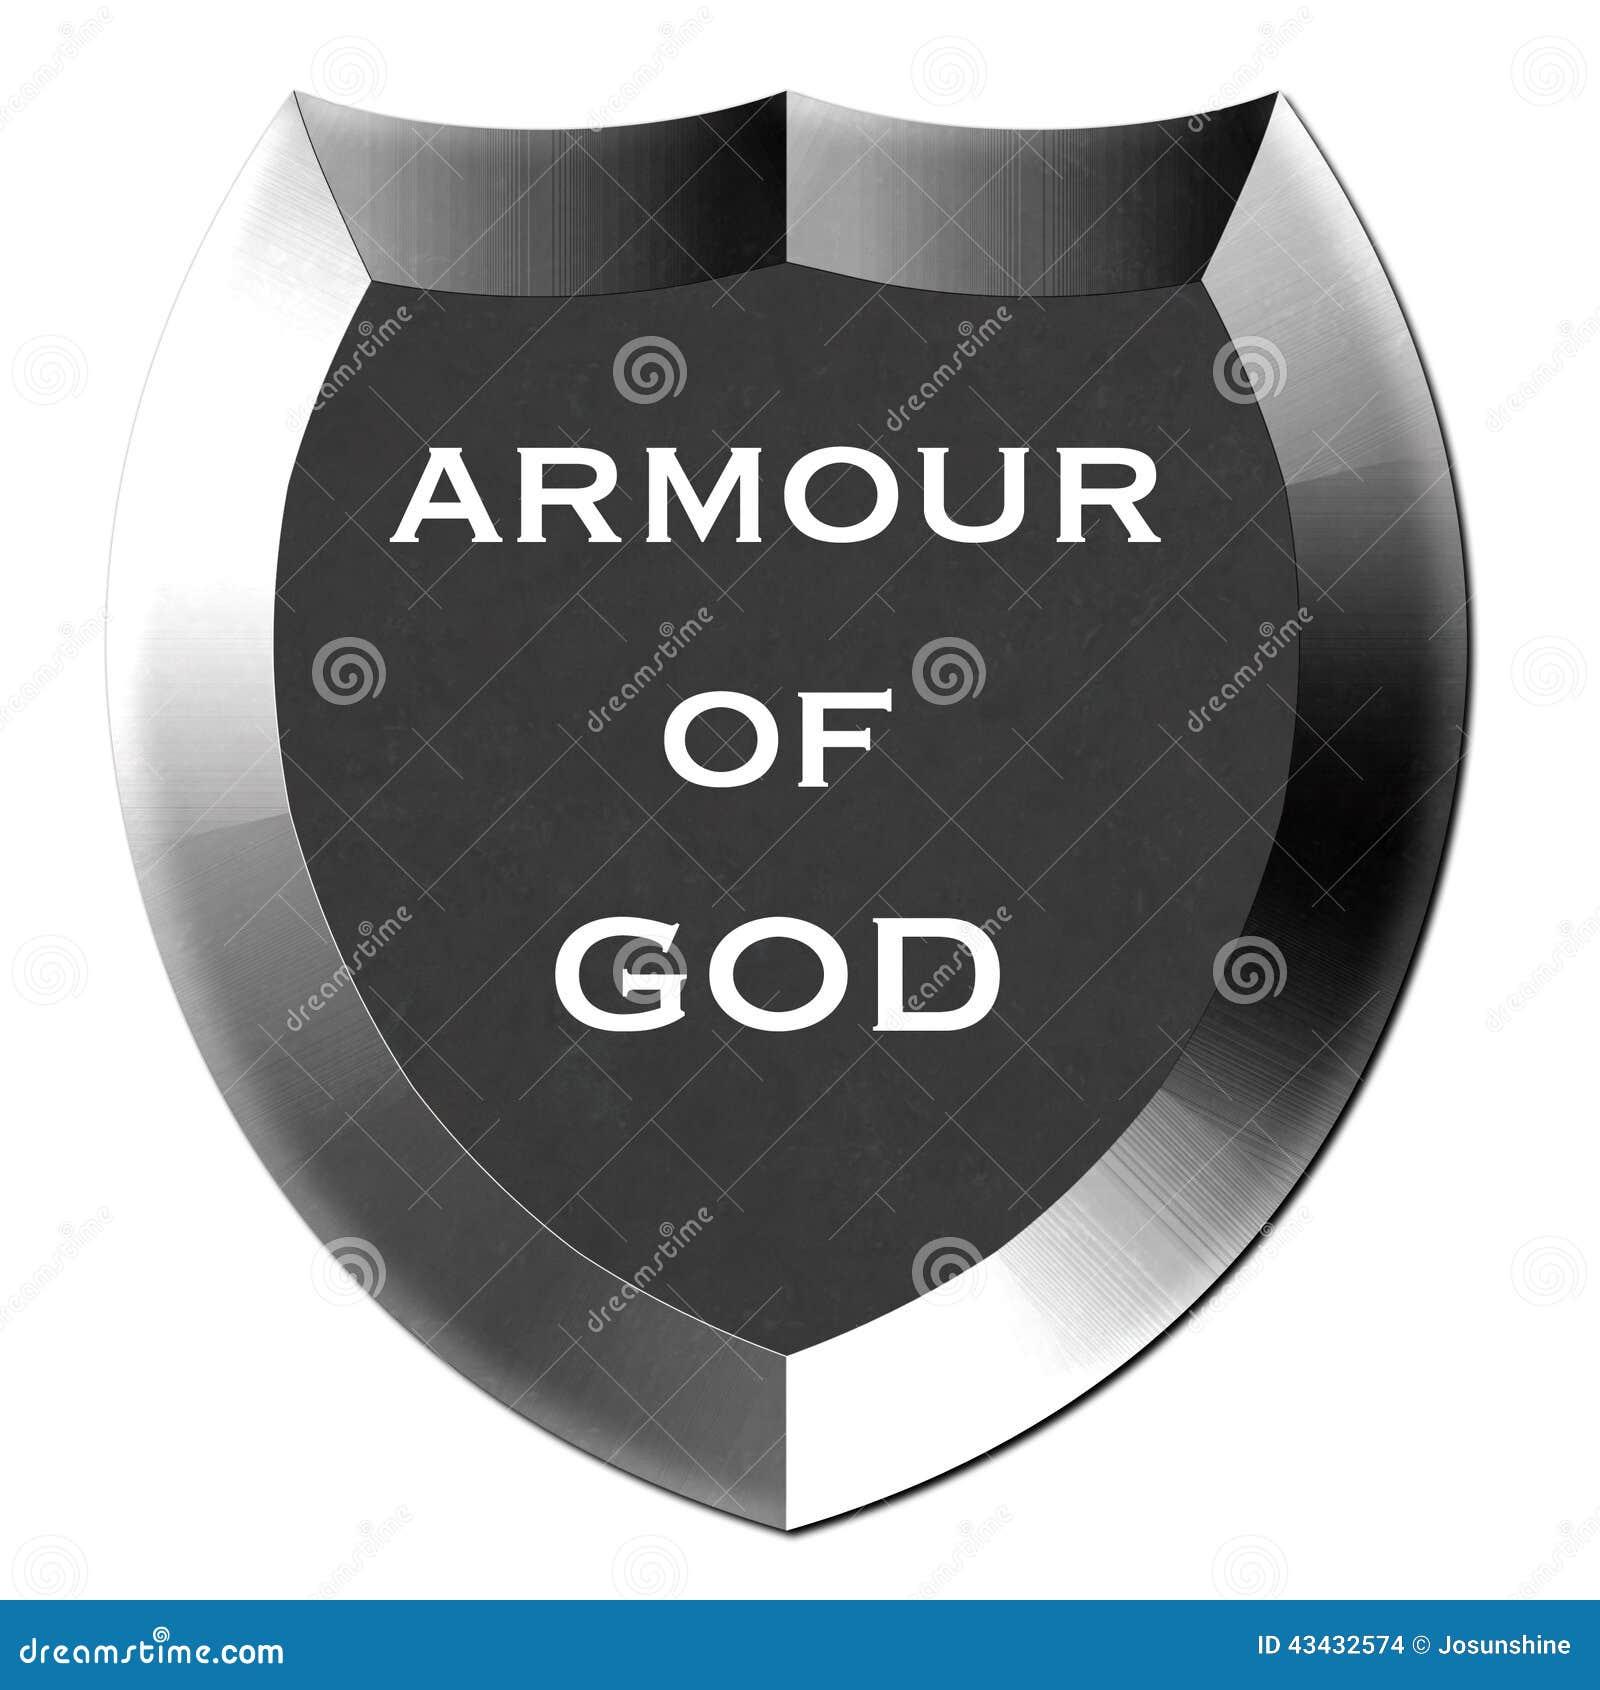 armour of god shield stock illustration image 43432574